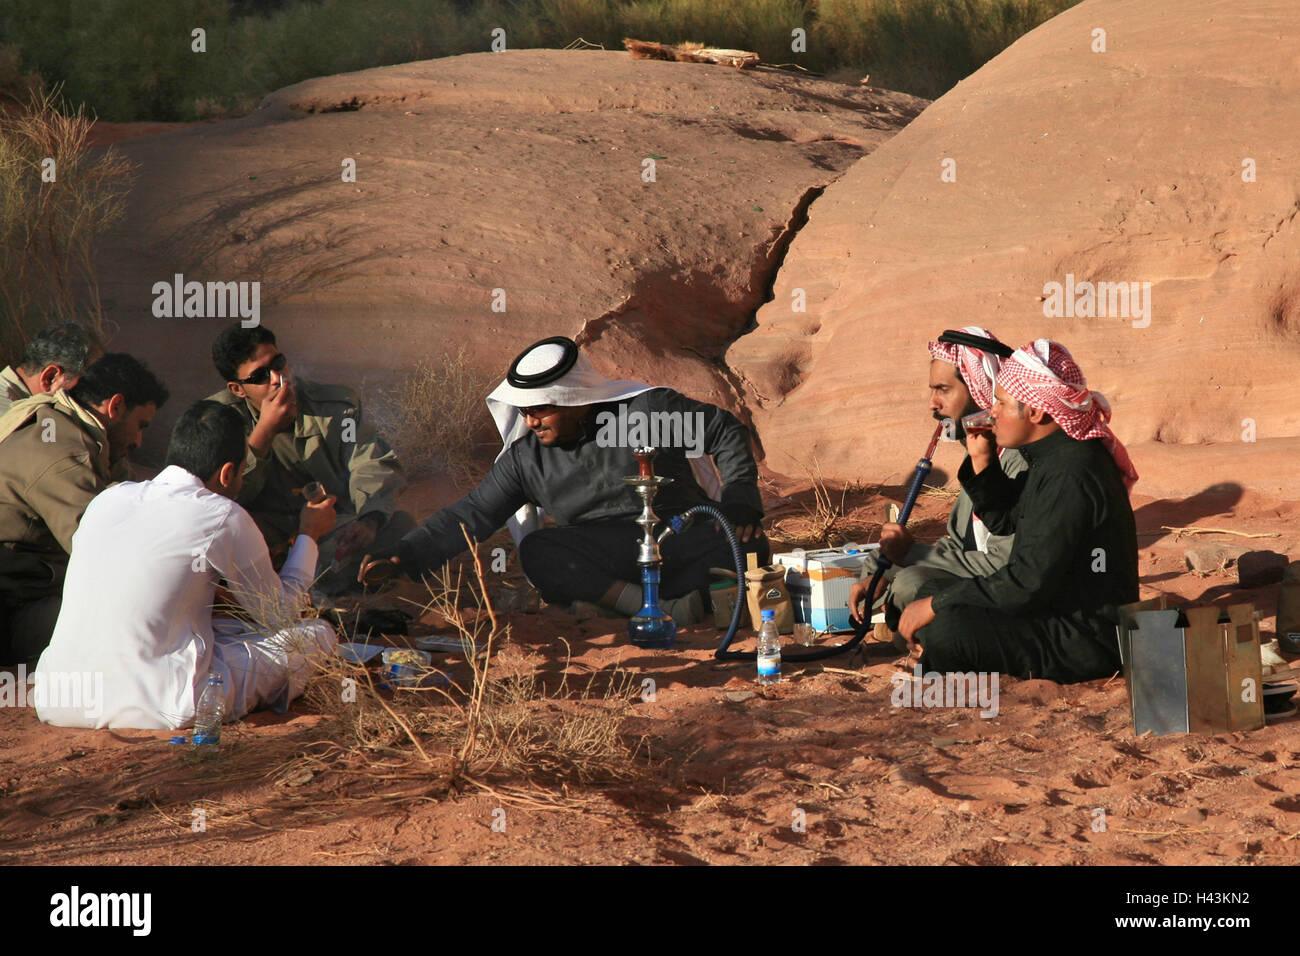 Saudi Arabia, province Asir, Hisma-mountain world, men, rest, water whistles, smoke, - Stock Image